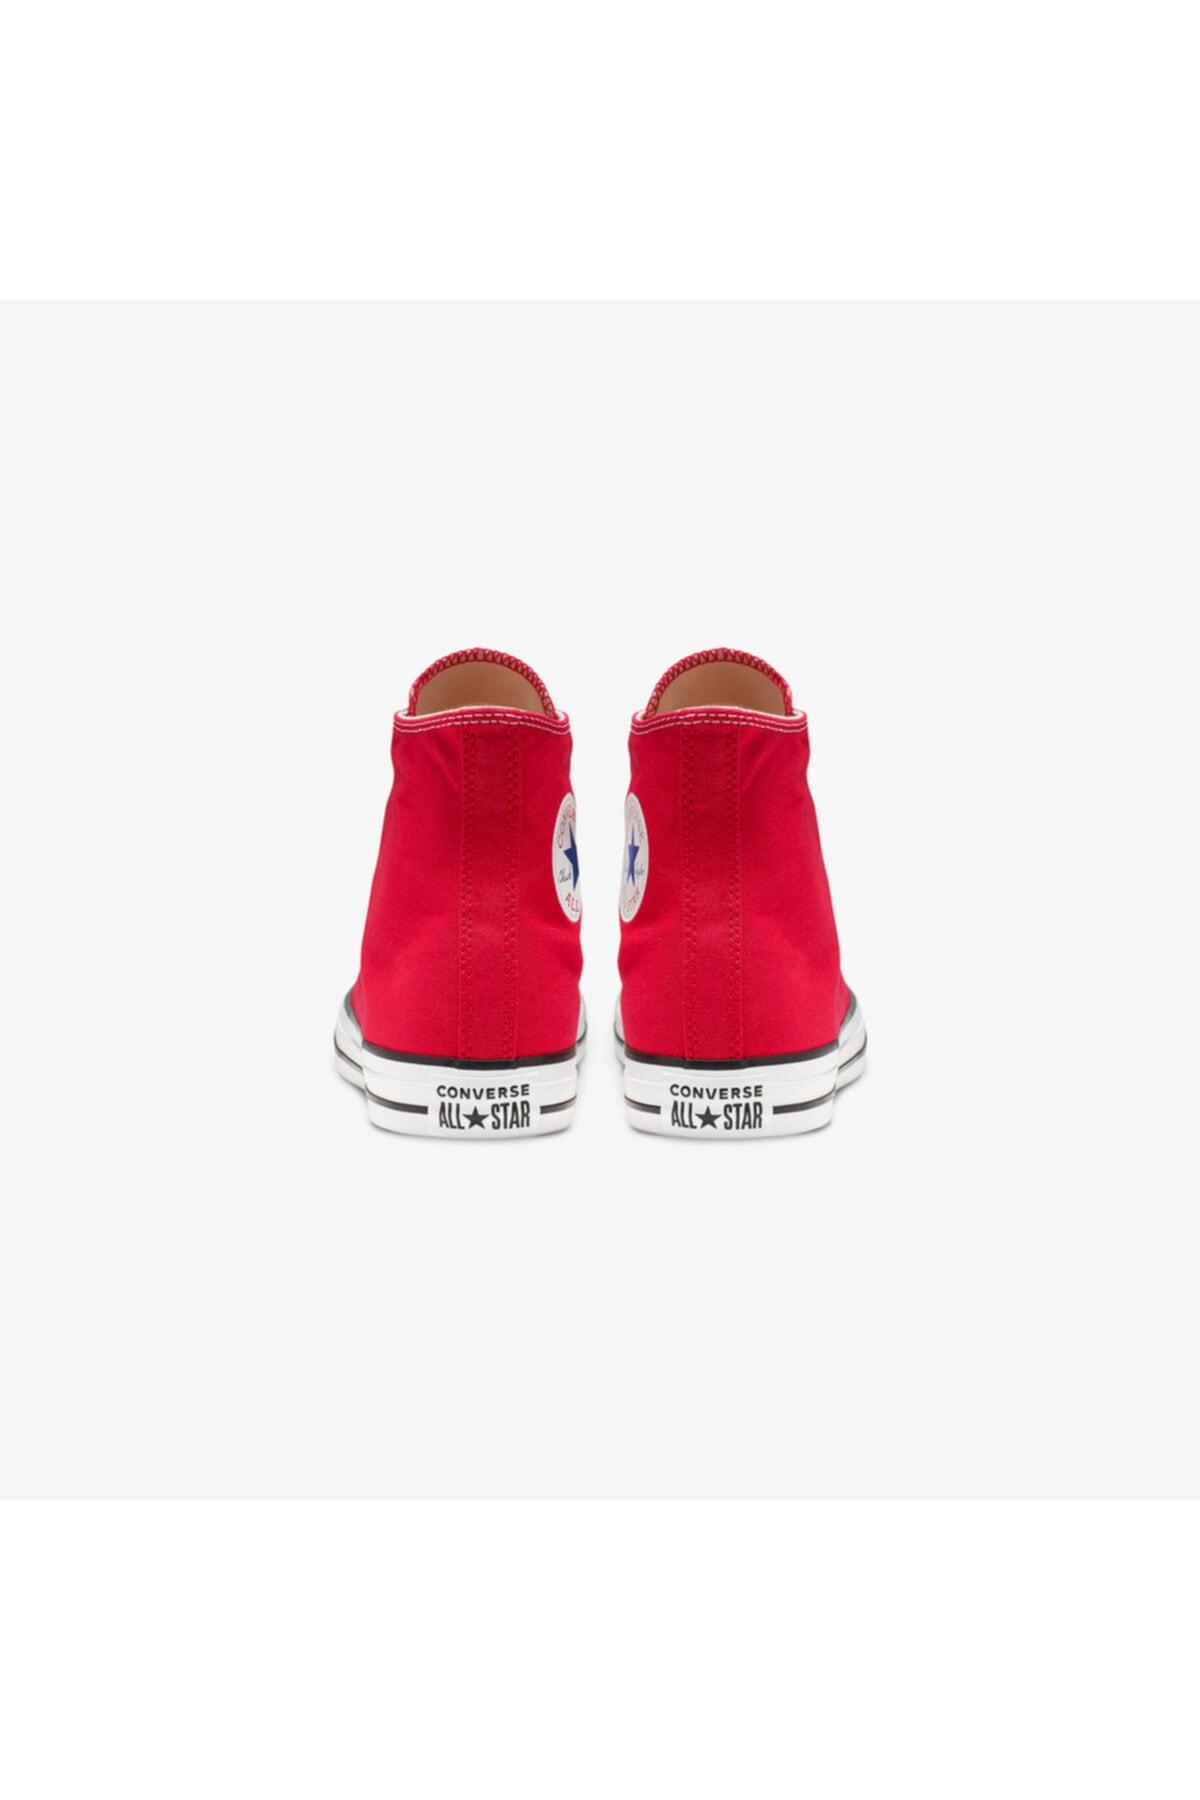 converse Unisex Kırmızı Chuck Taylor All Star Hi Sneaker Ayakkabı 2